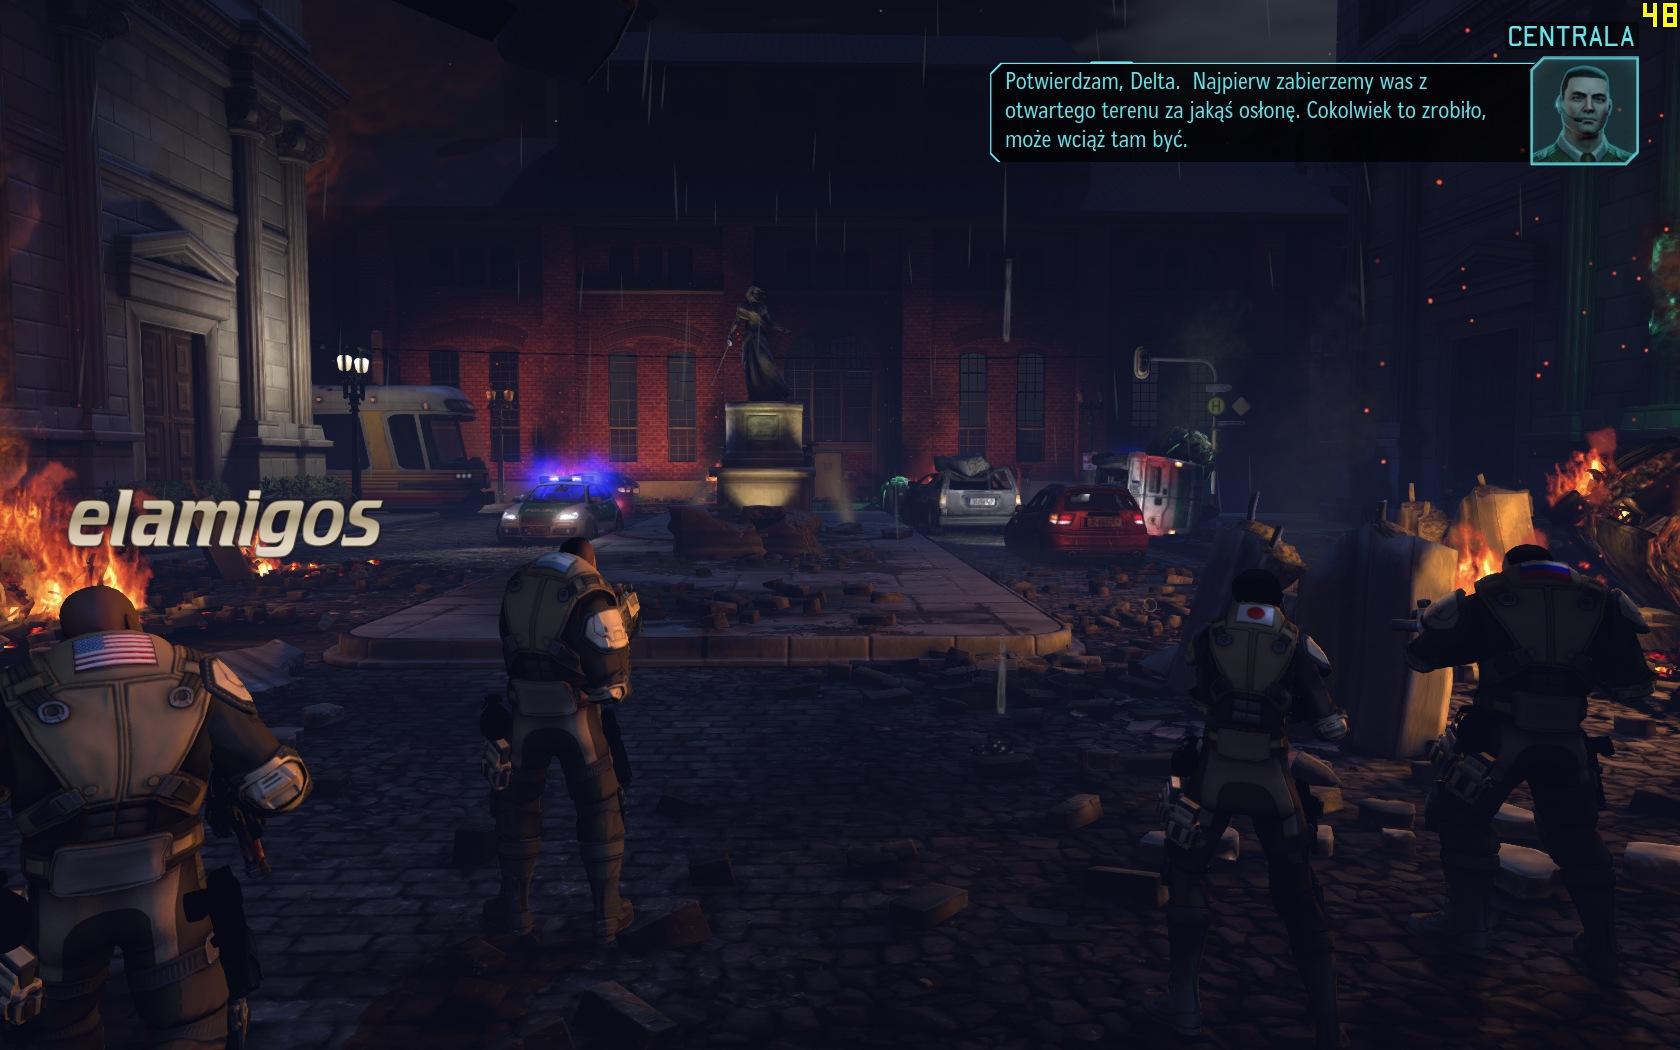 Xcom enemy unknown crack only flt updated dec 2017